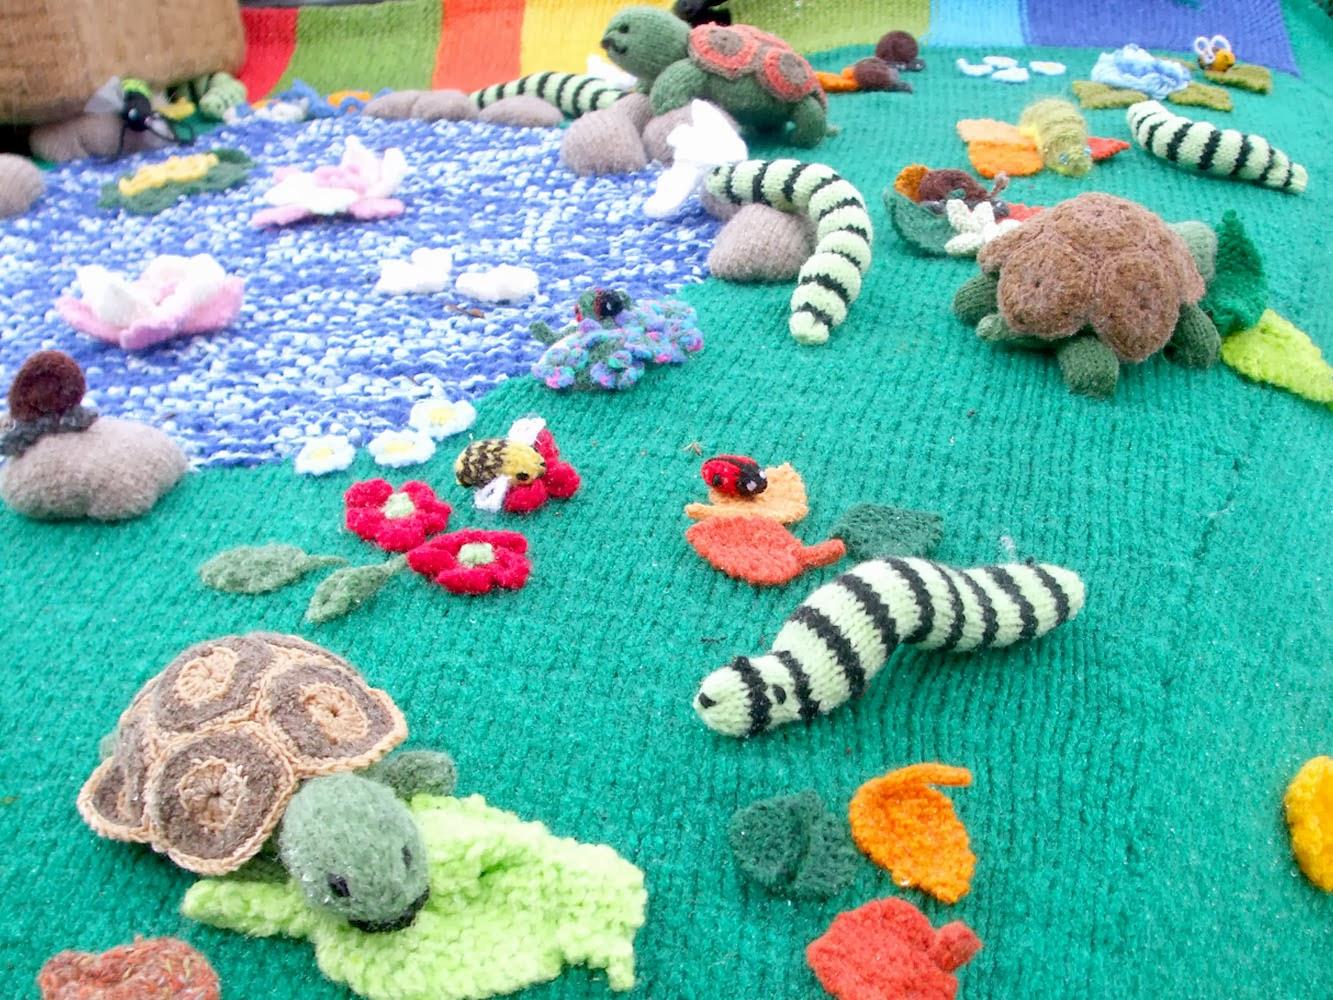 NezumiWorld Blog: The Knitting and Stitching Show 2013